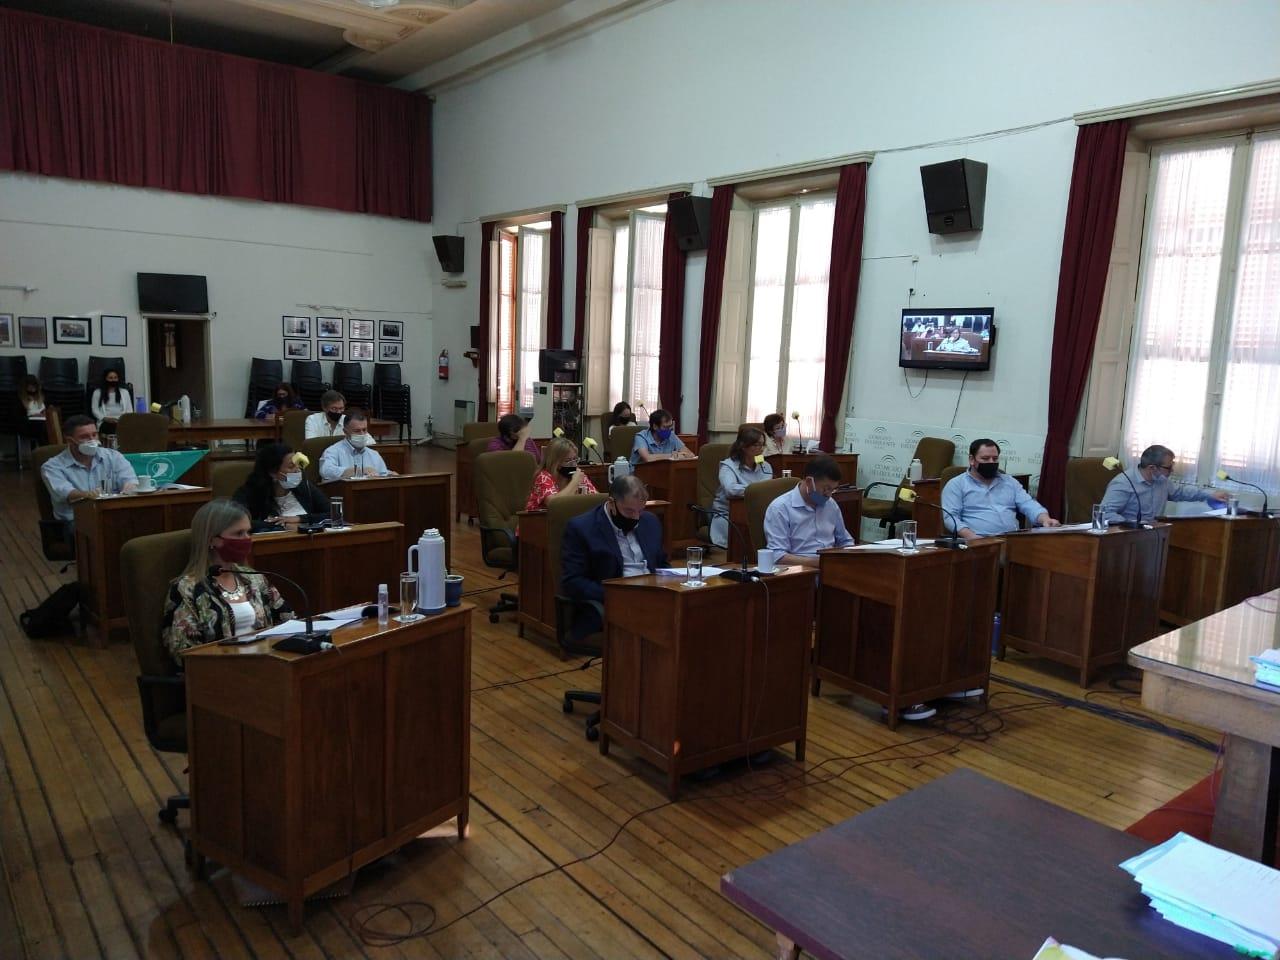 Concejo Deliberante: Sesión Especial con tratamiento de Ordenanza Fiscal e Impositiva